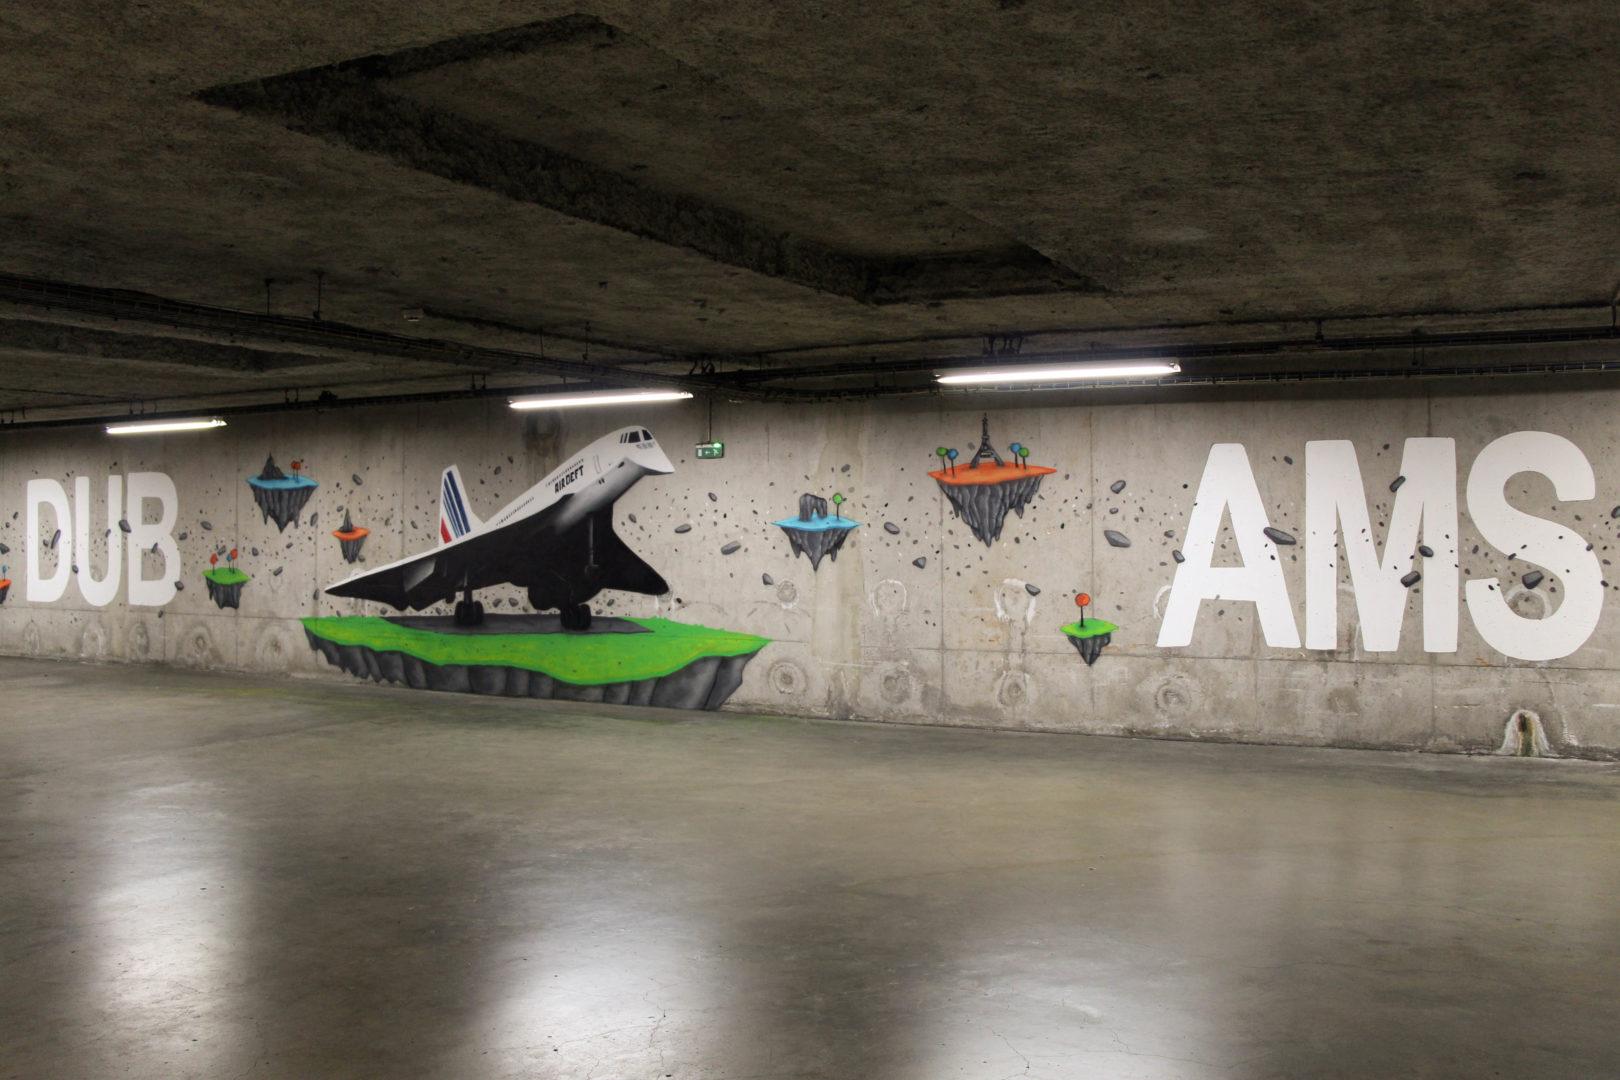 Aéroport-Clermont-Ferrand-Graffiti